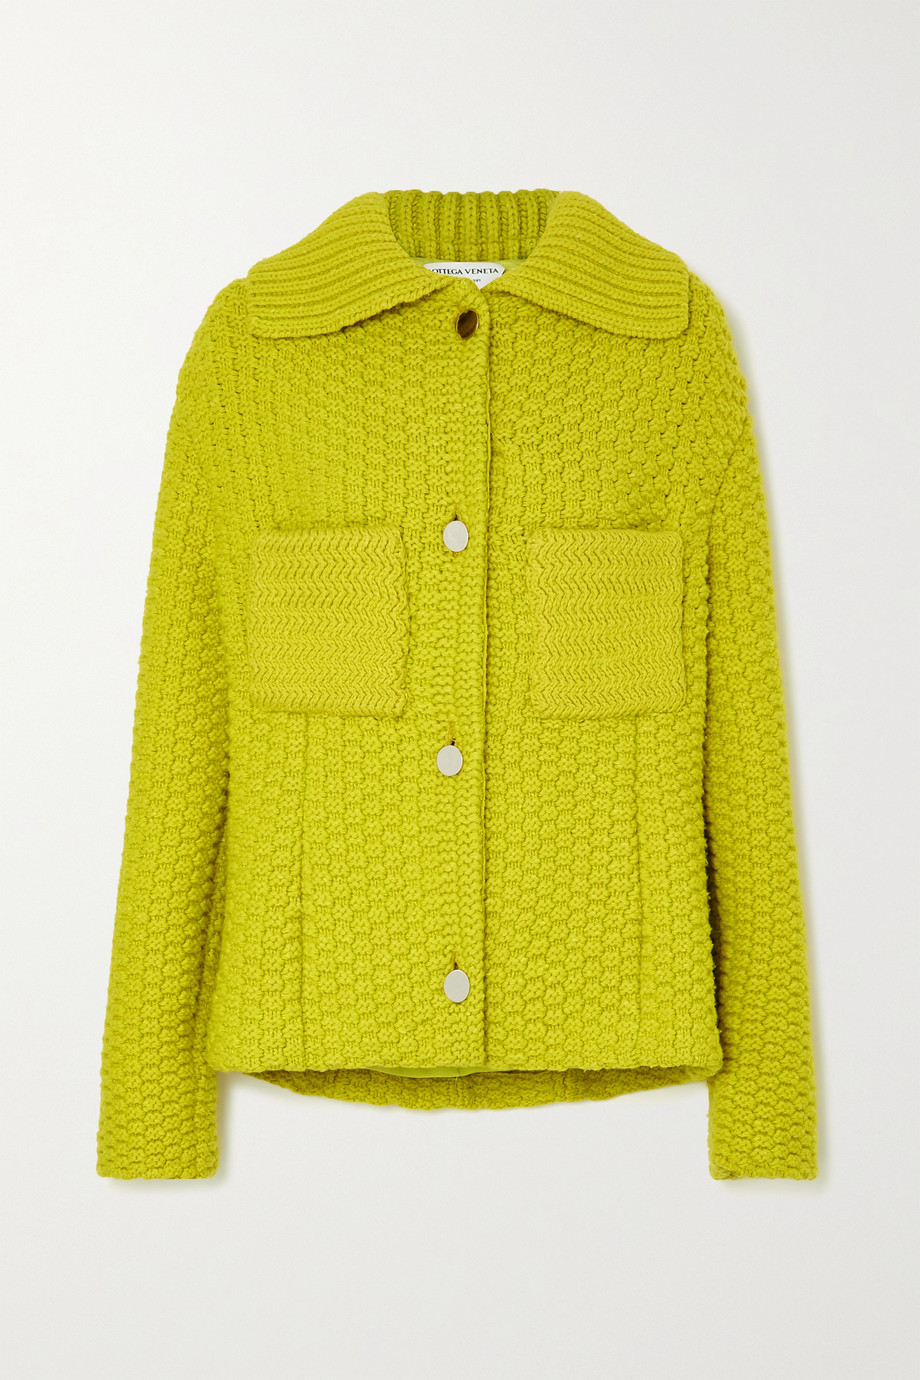 Bottega Veneta Waffle-knit wool-blend jacket